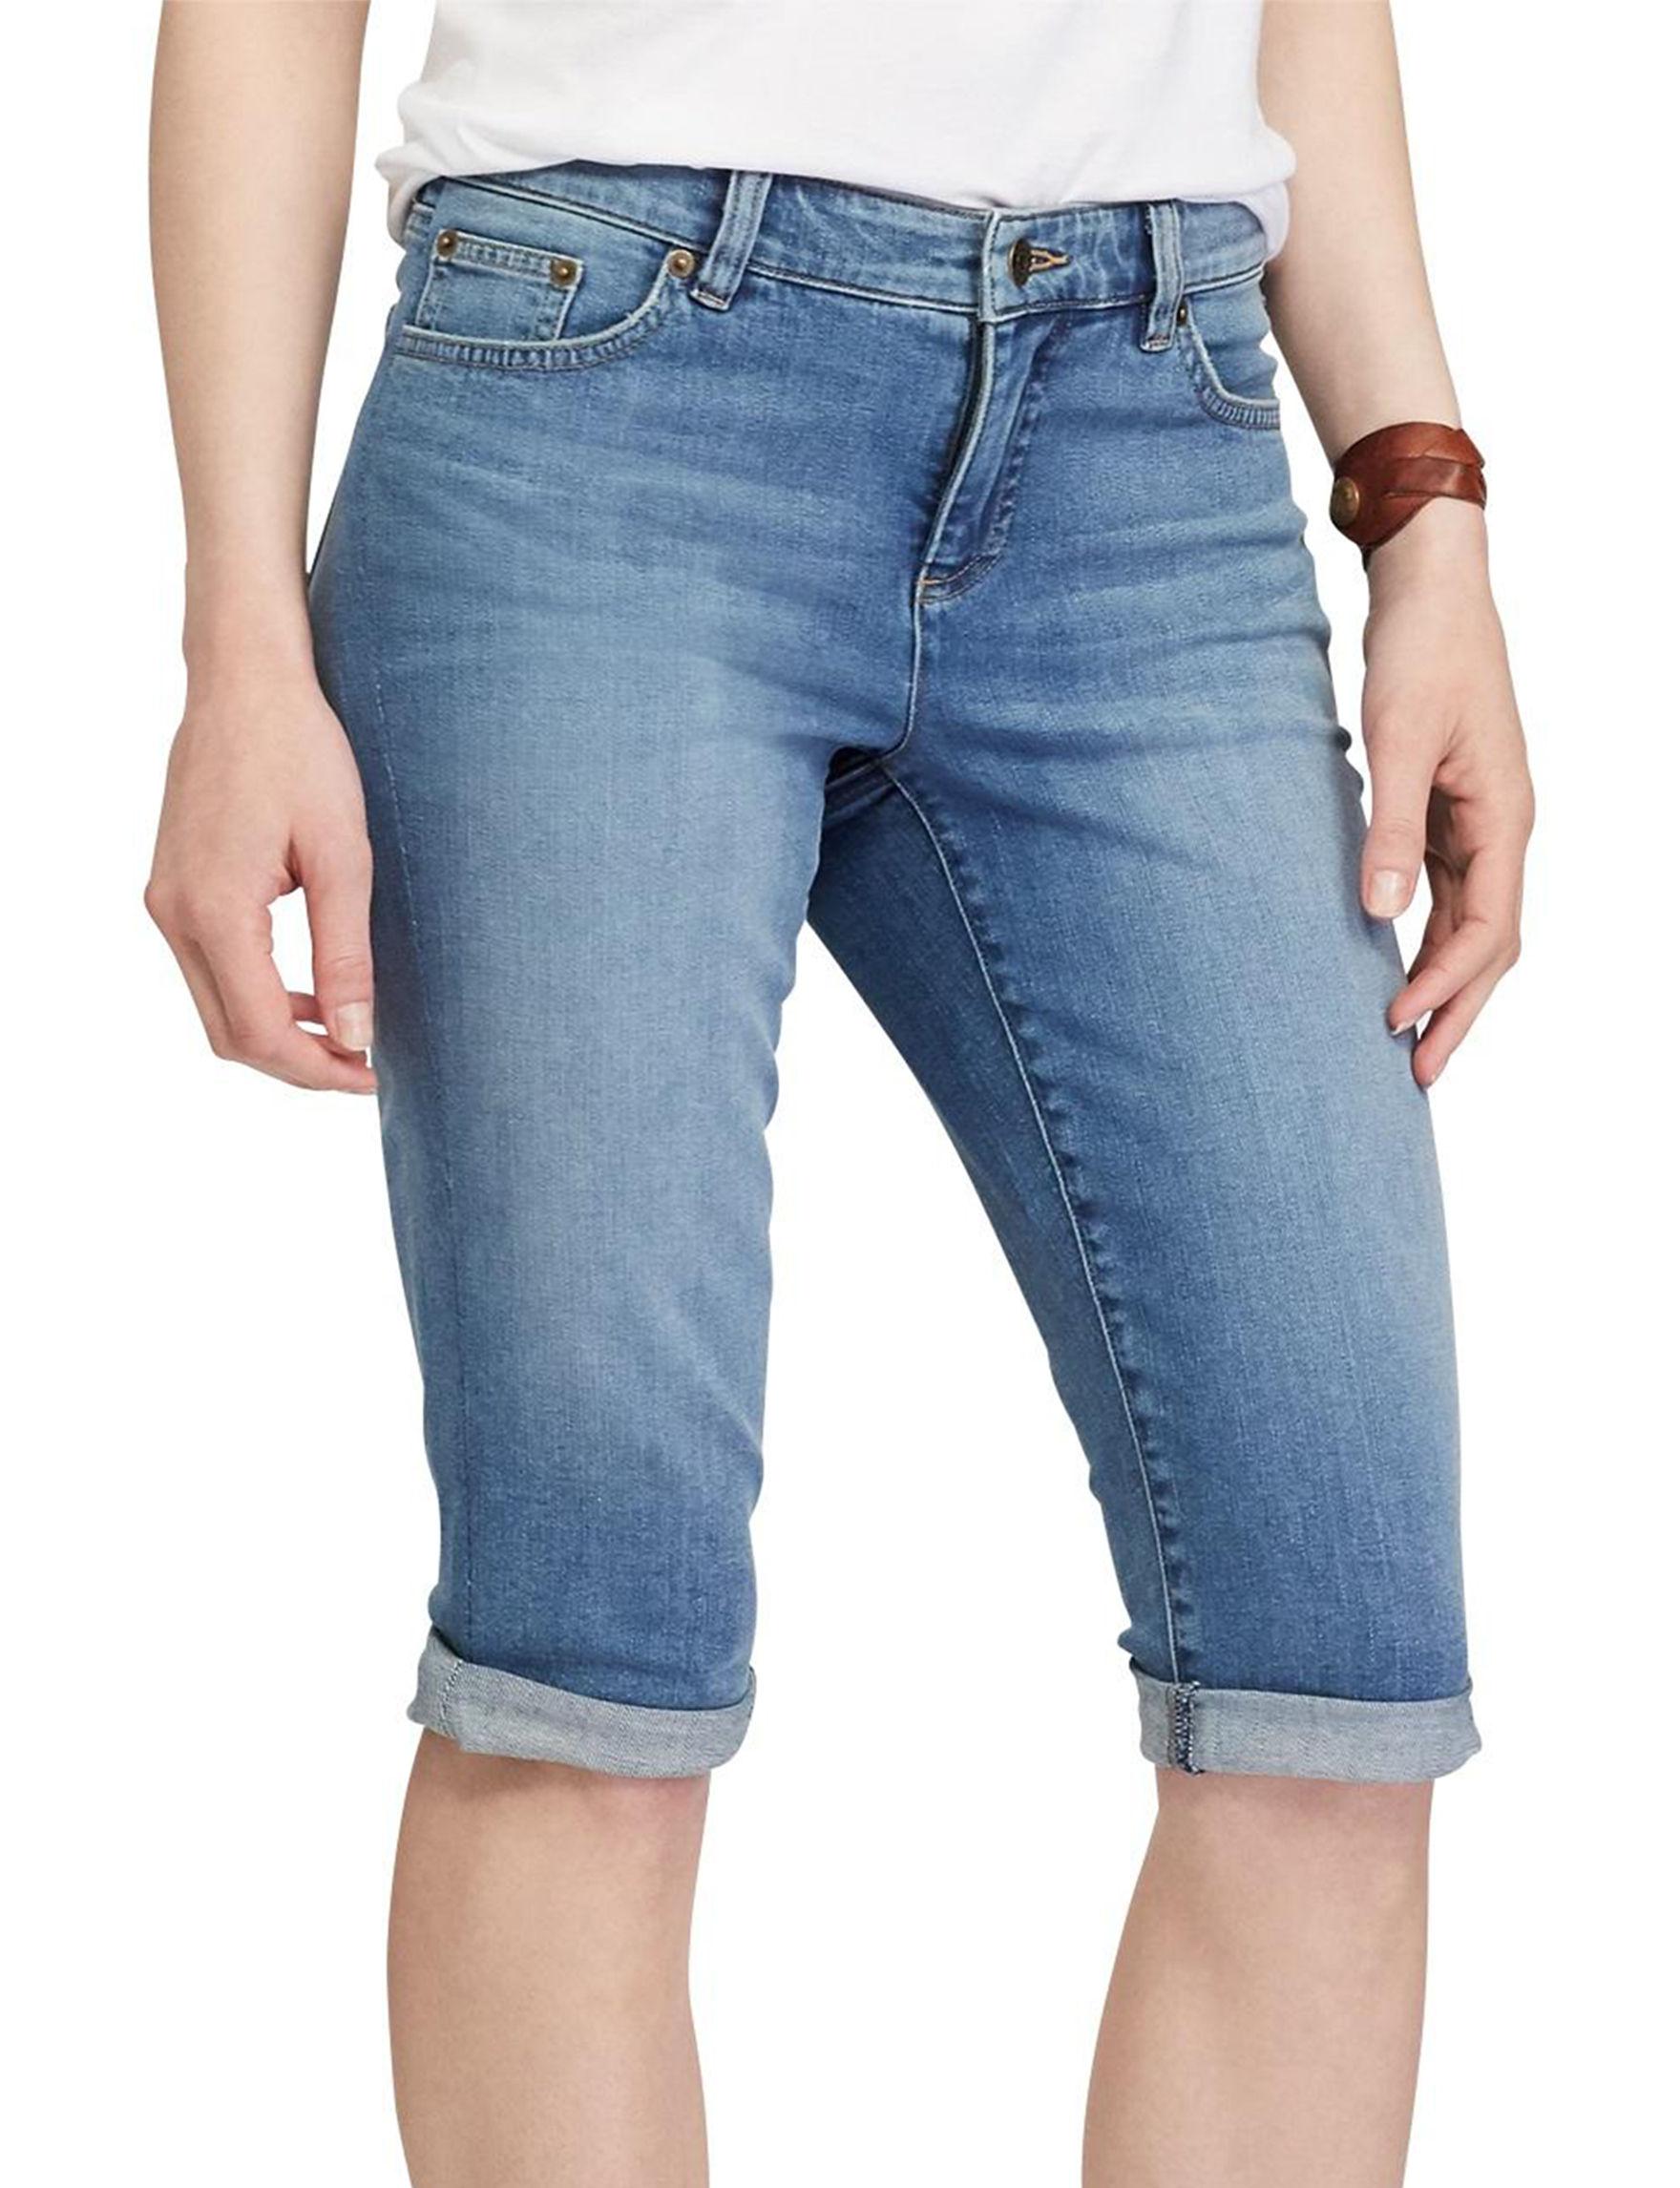 Chaps Blue Denim Shorts